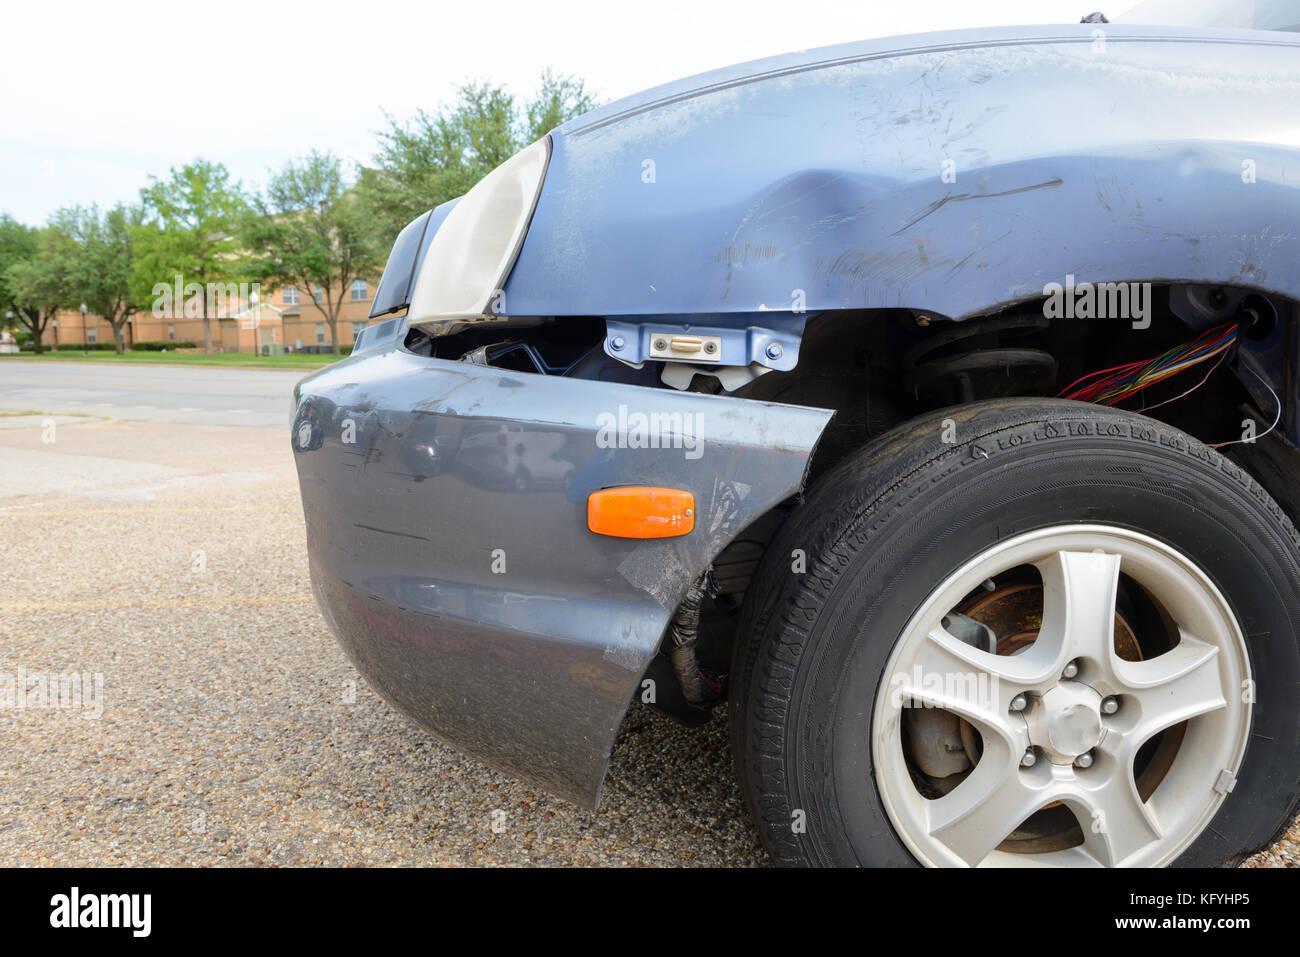 Flat Tire After Car Service